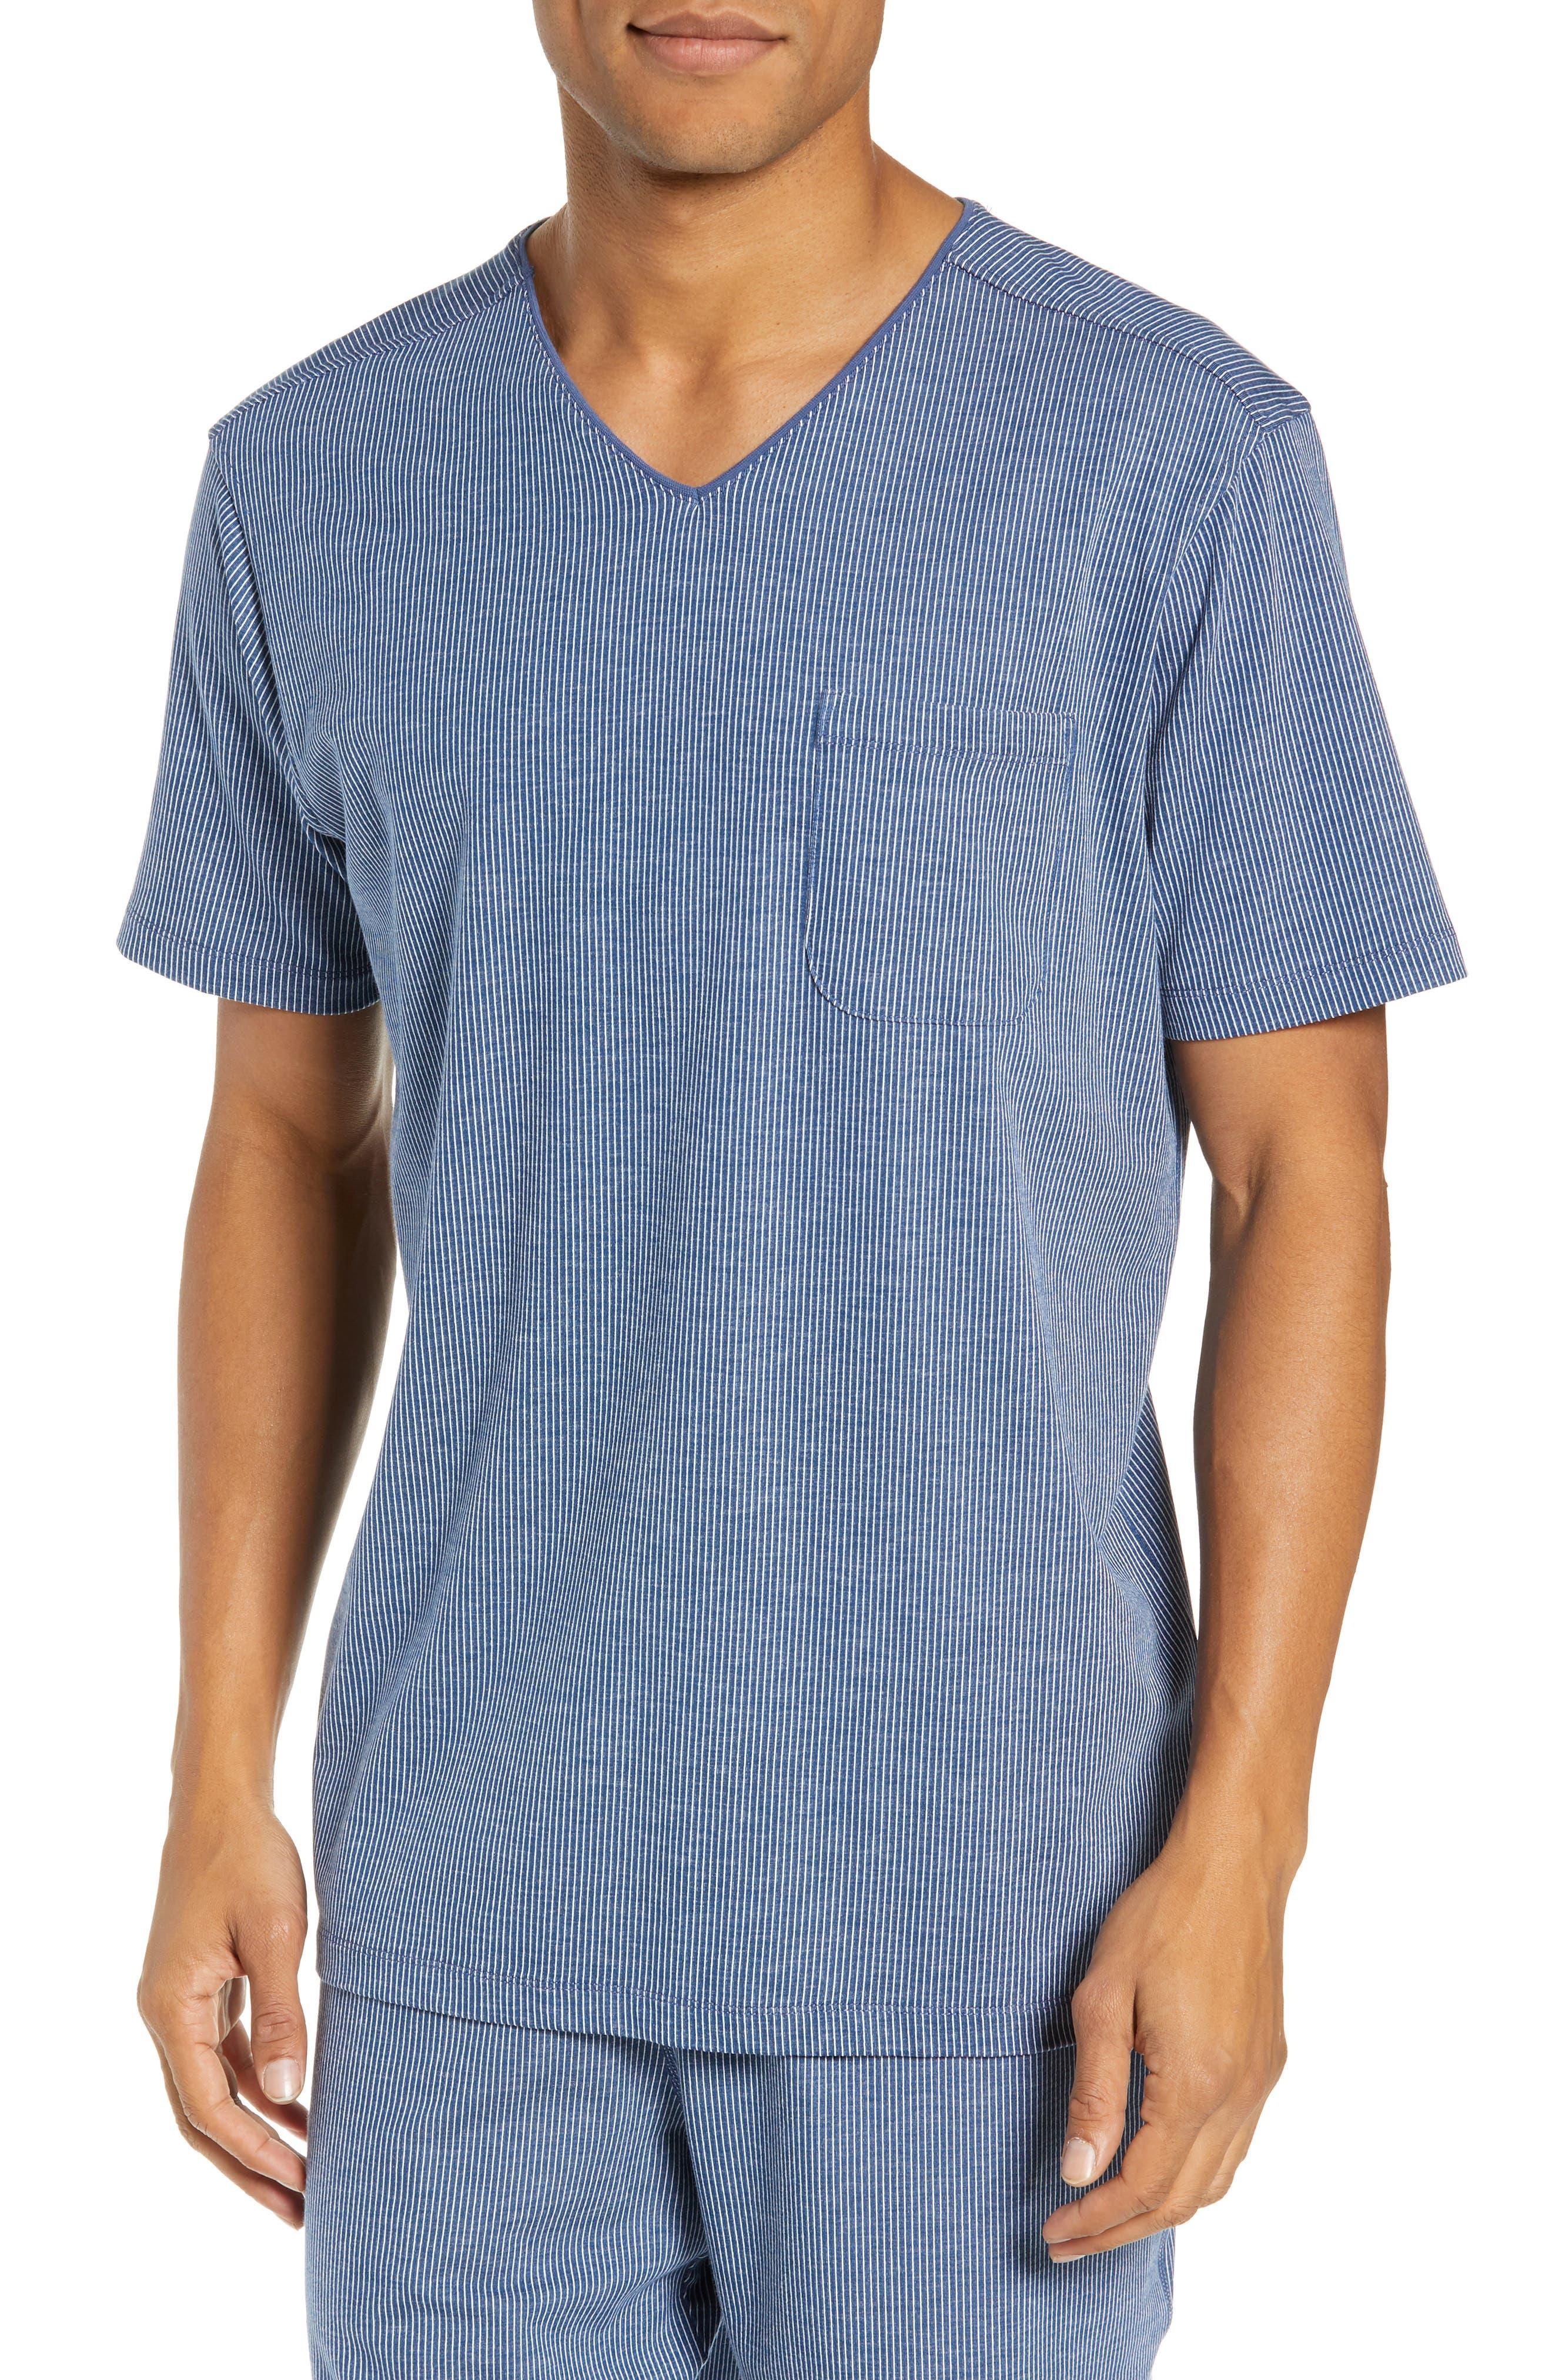 Pinstripe Sleep T-Shirt,                             Main thumbnail 1, color,                             BLUE